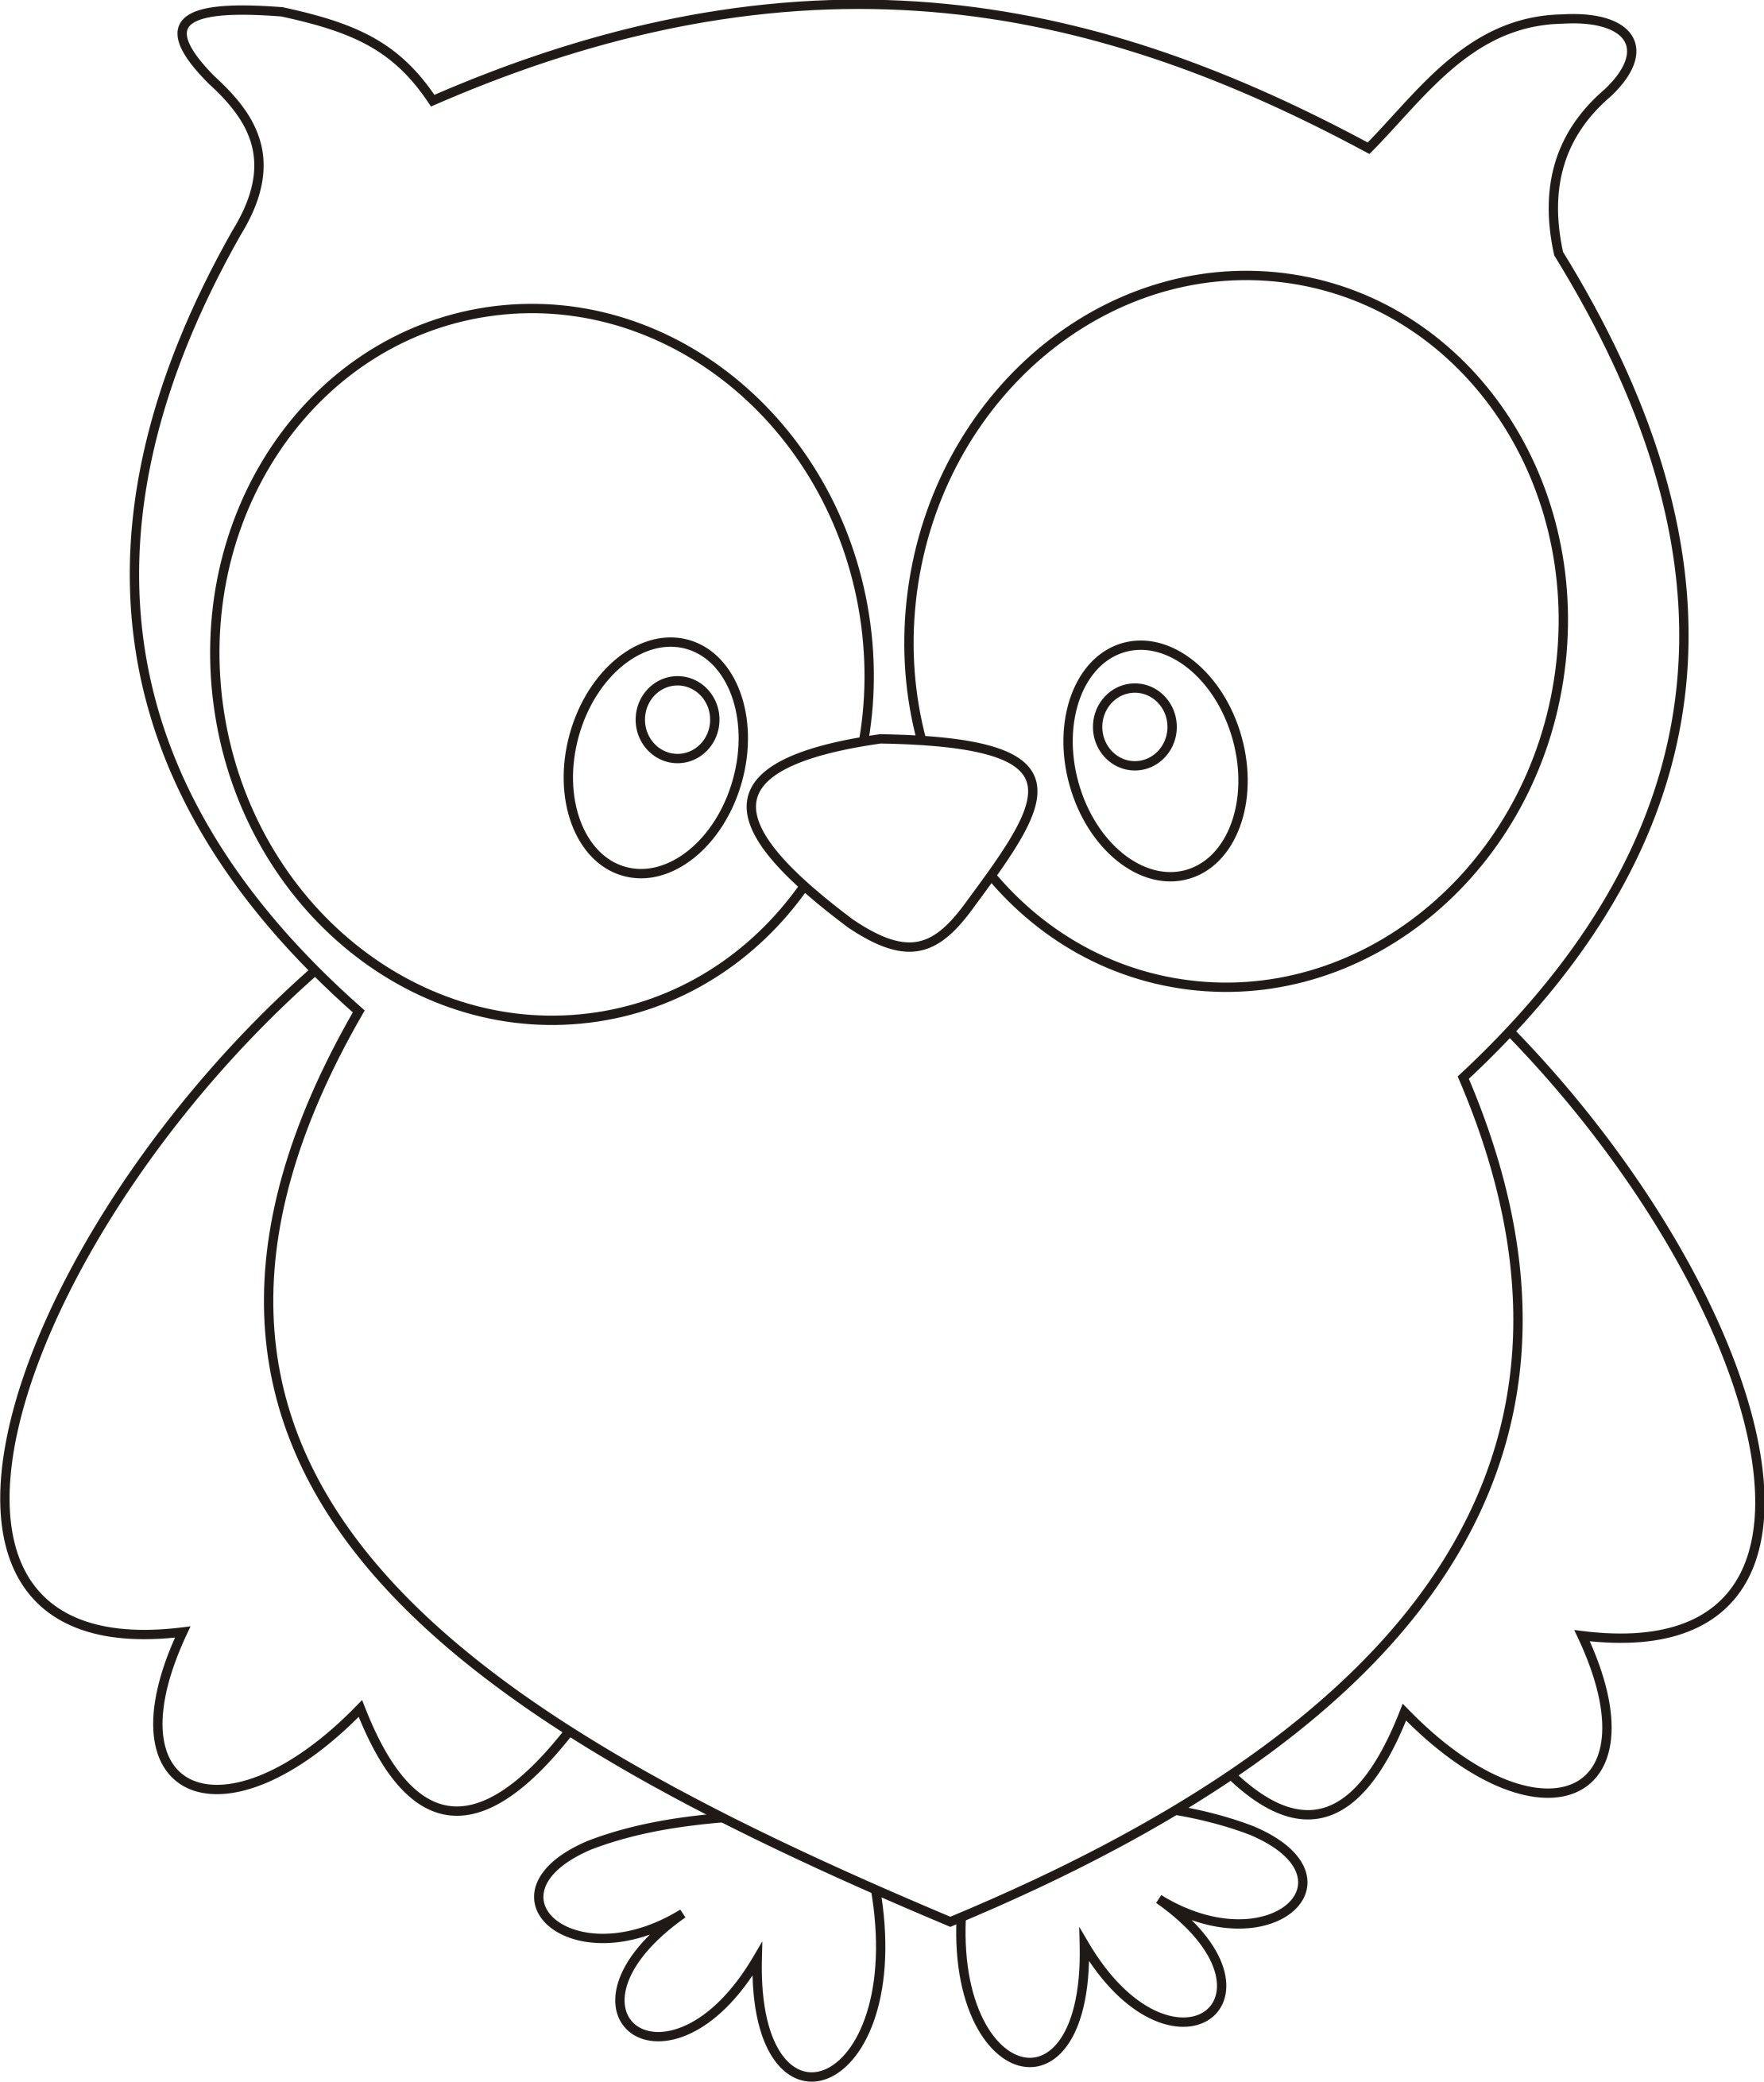 Template free tecknat pinterest template free and owl